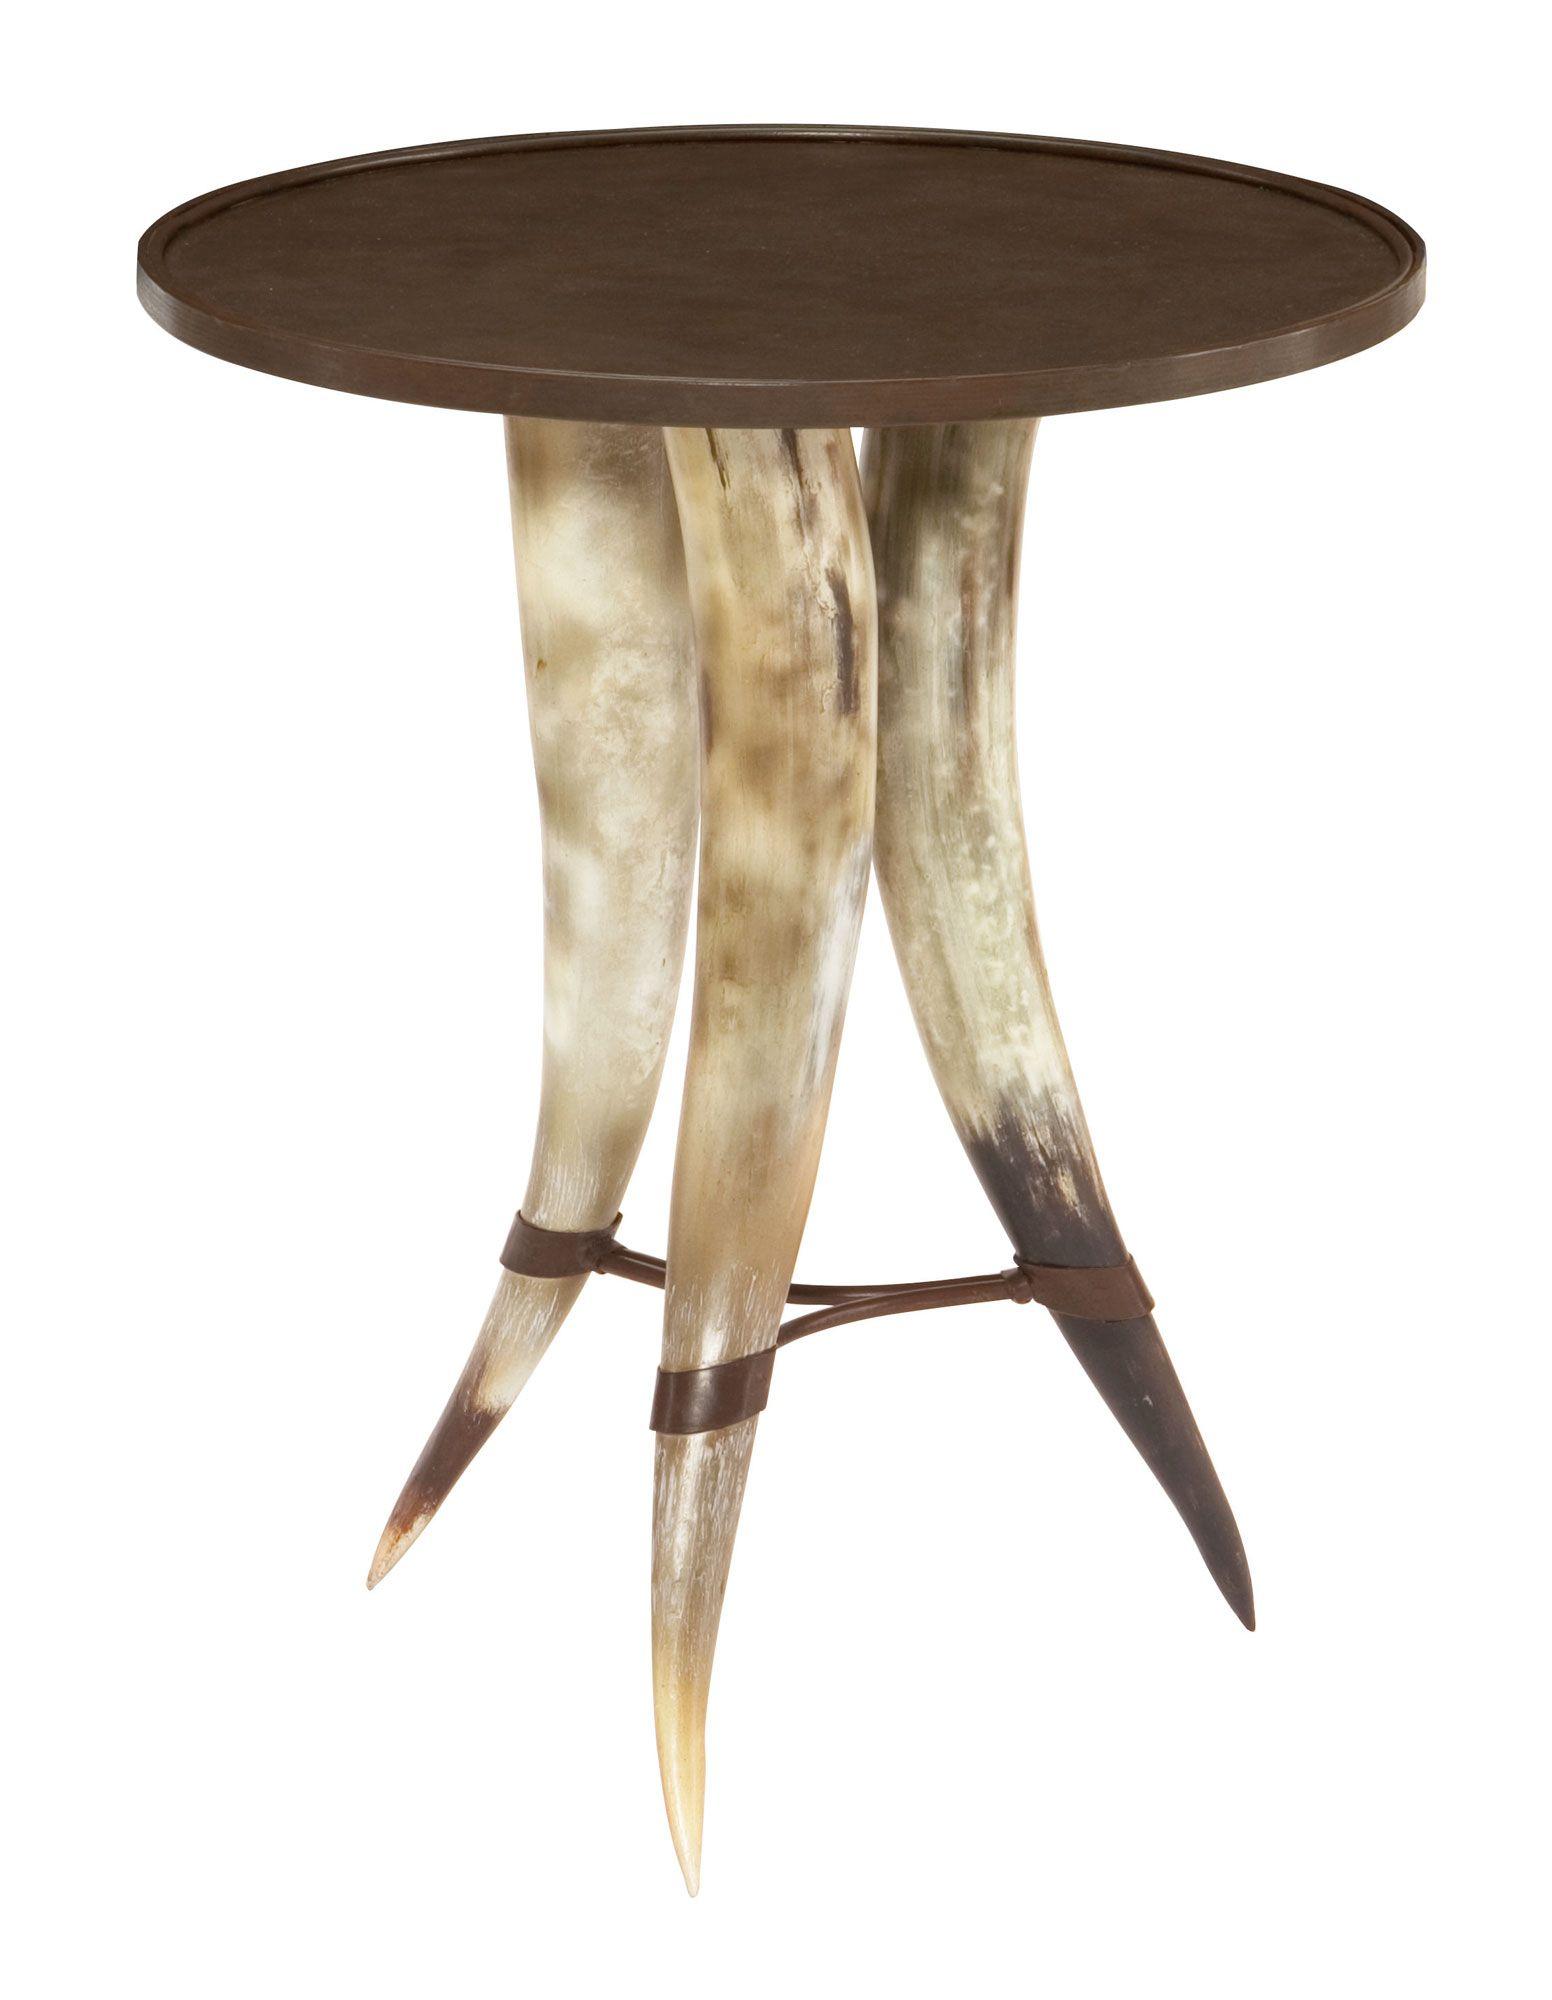 358 104 Texas Horn Chairside Table | Bernhardt Round Dia 20 H 24 Legs $765  #2Foot